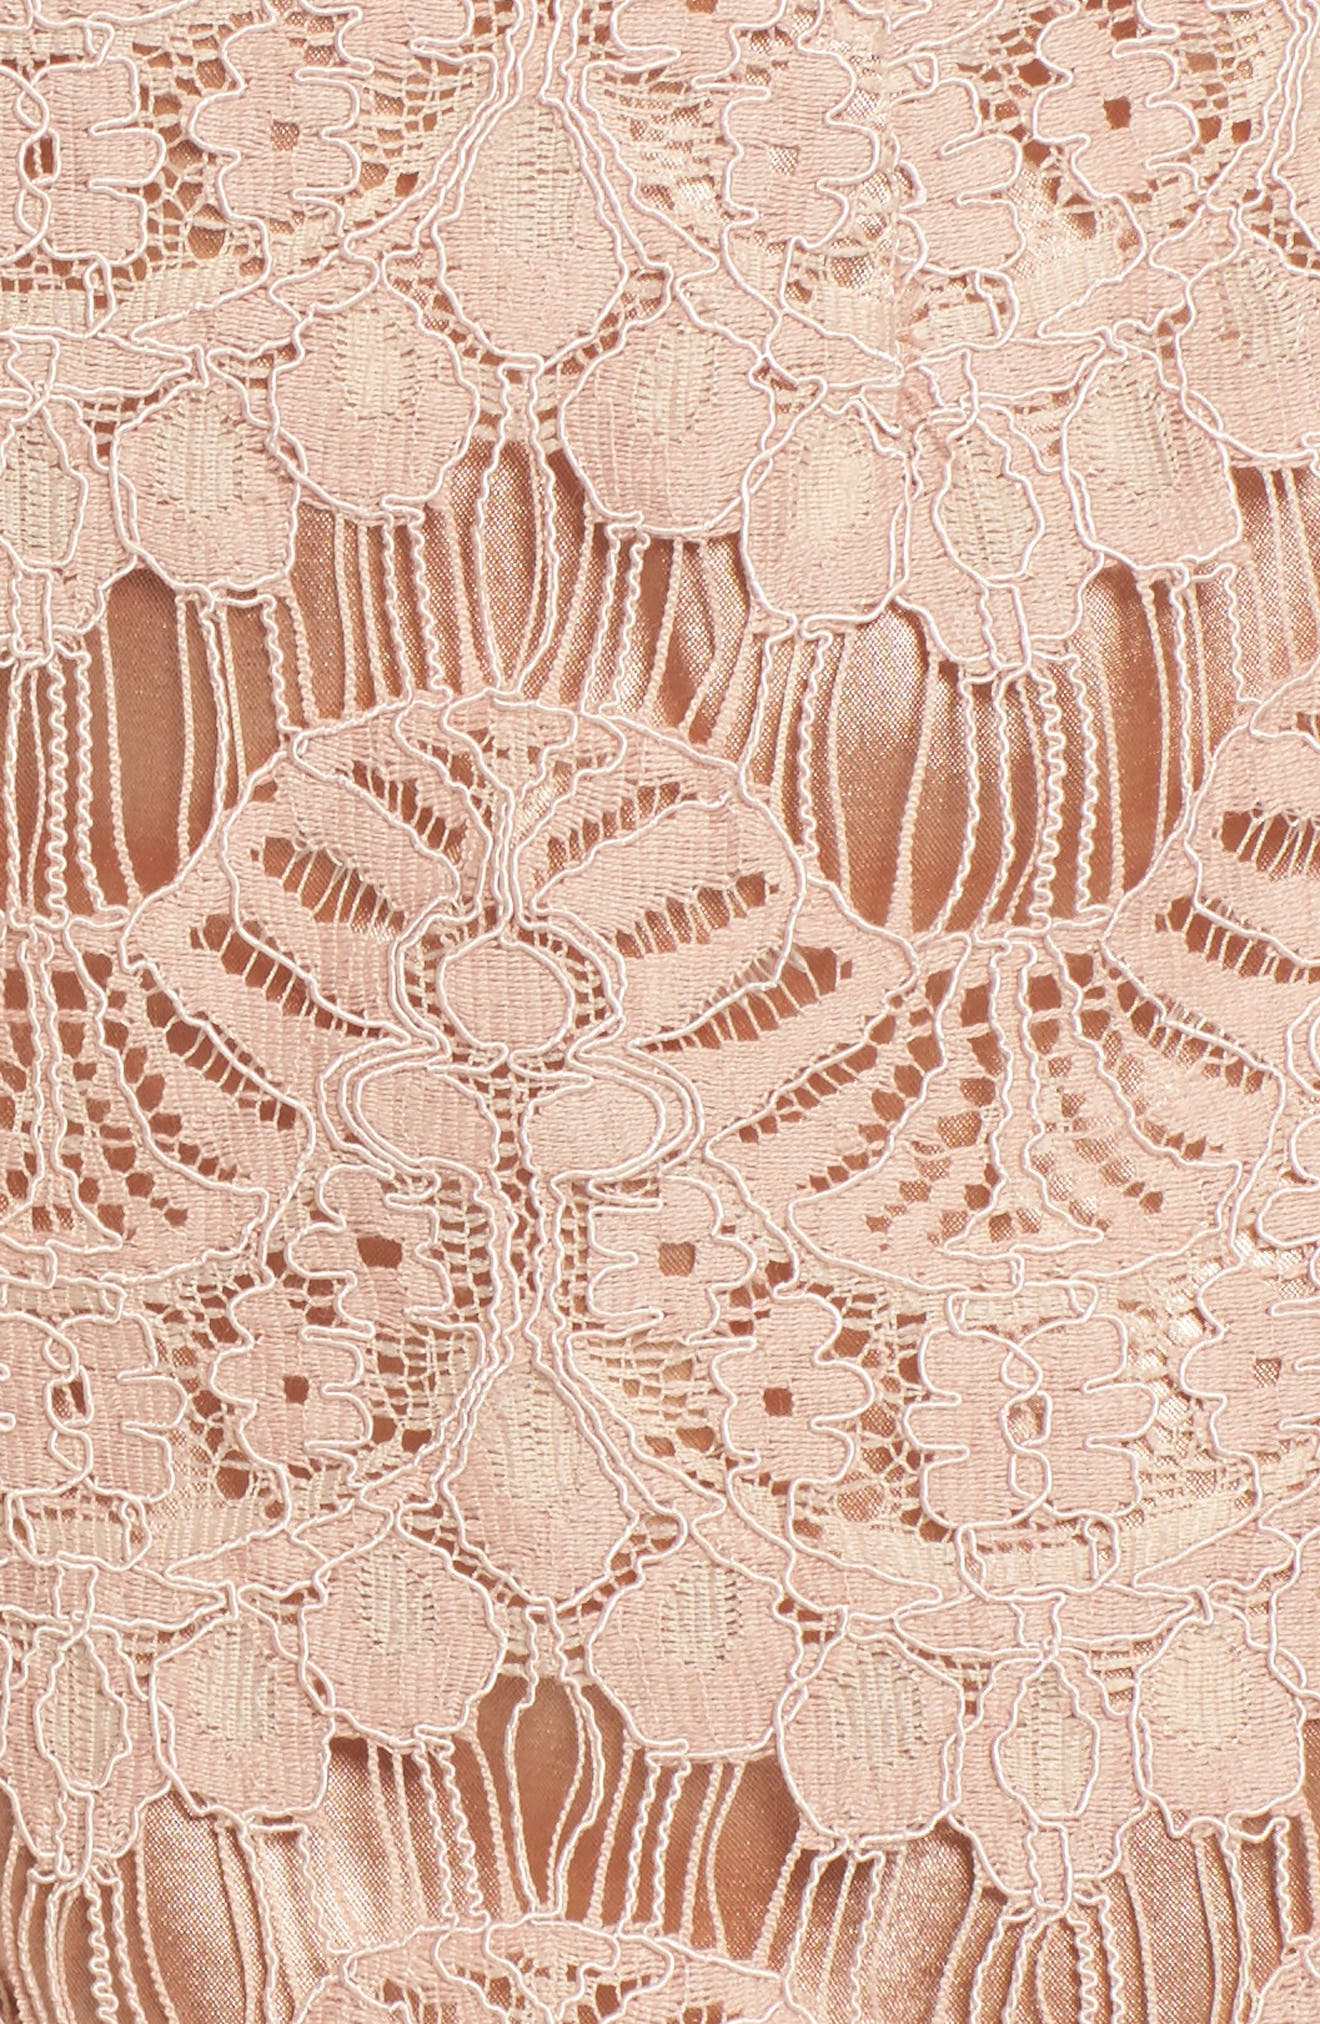 Lace Shorts,                             Alternate thumbnail 5, color,                             680